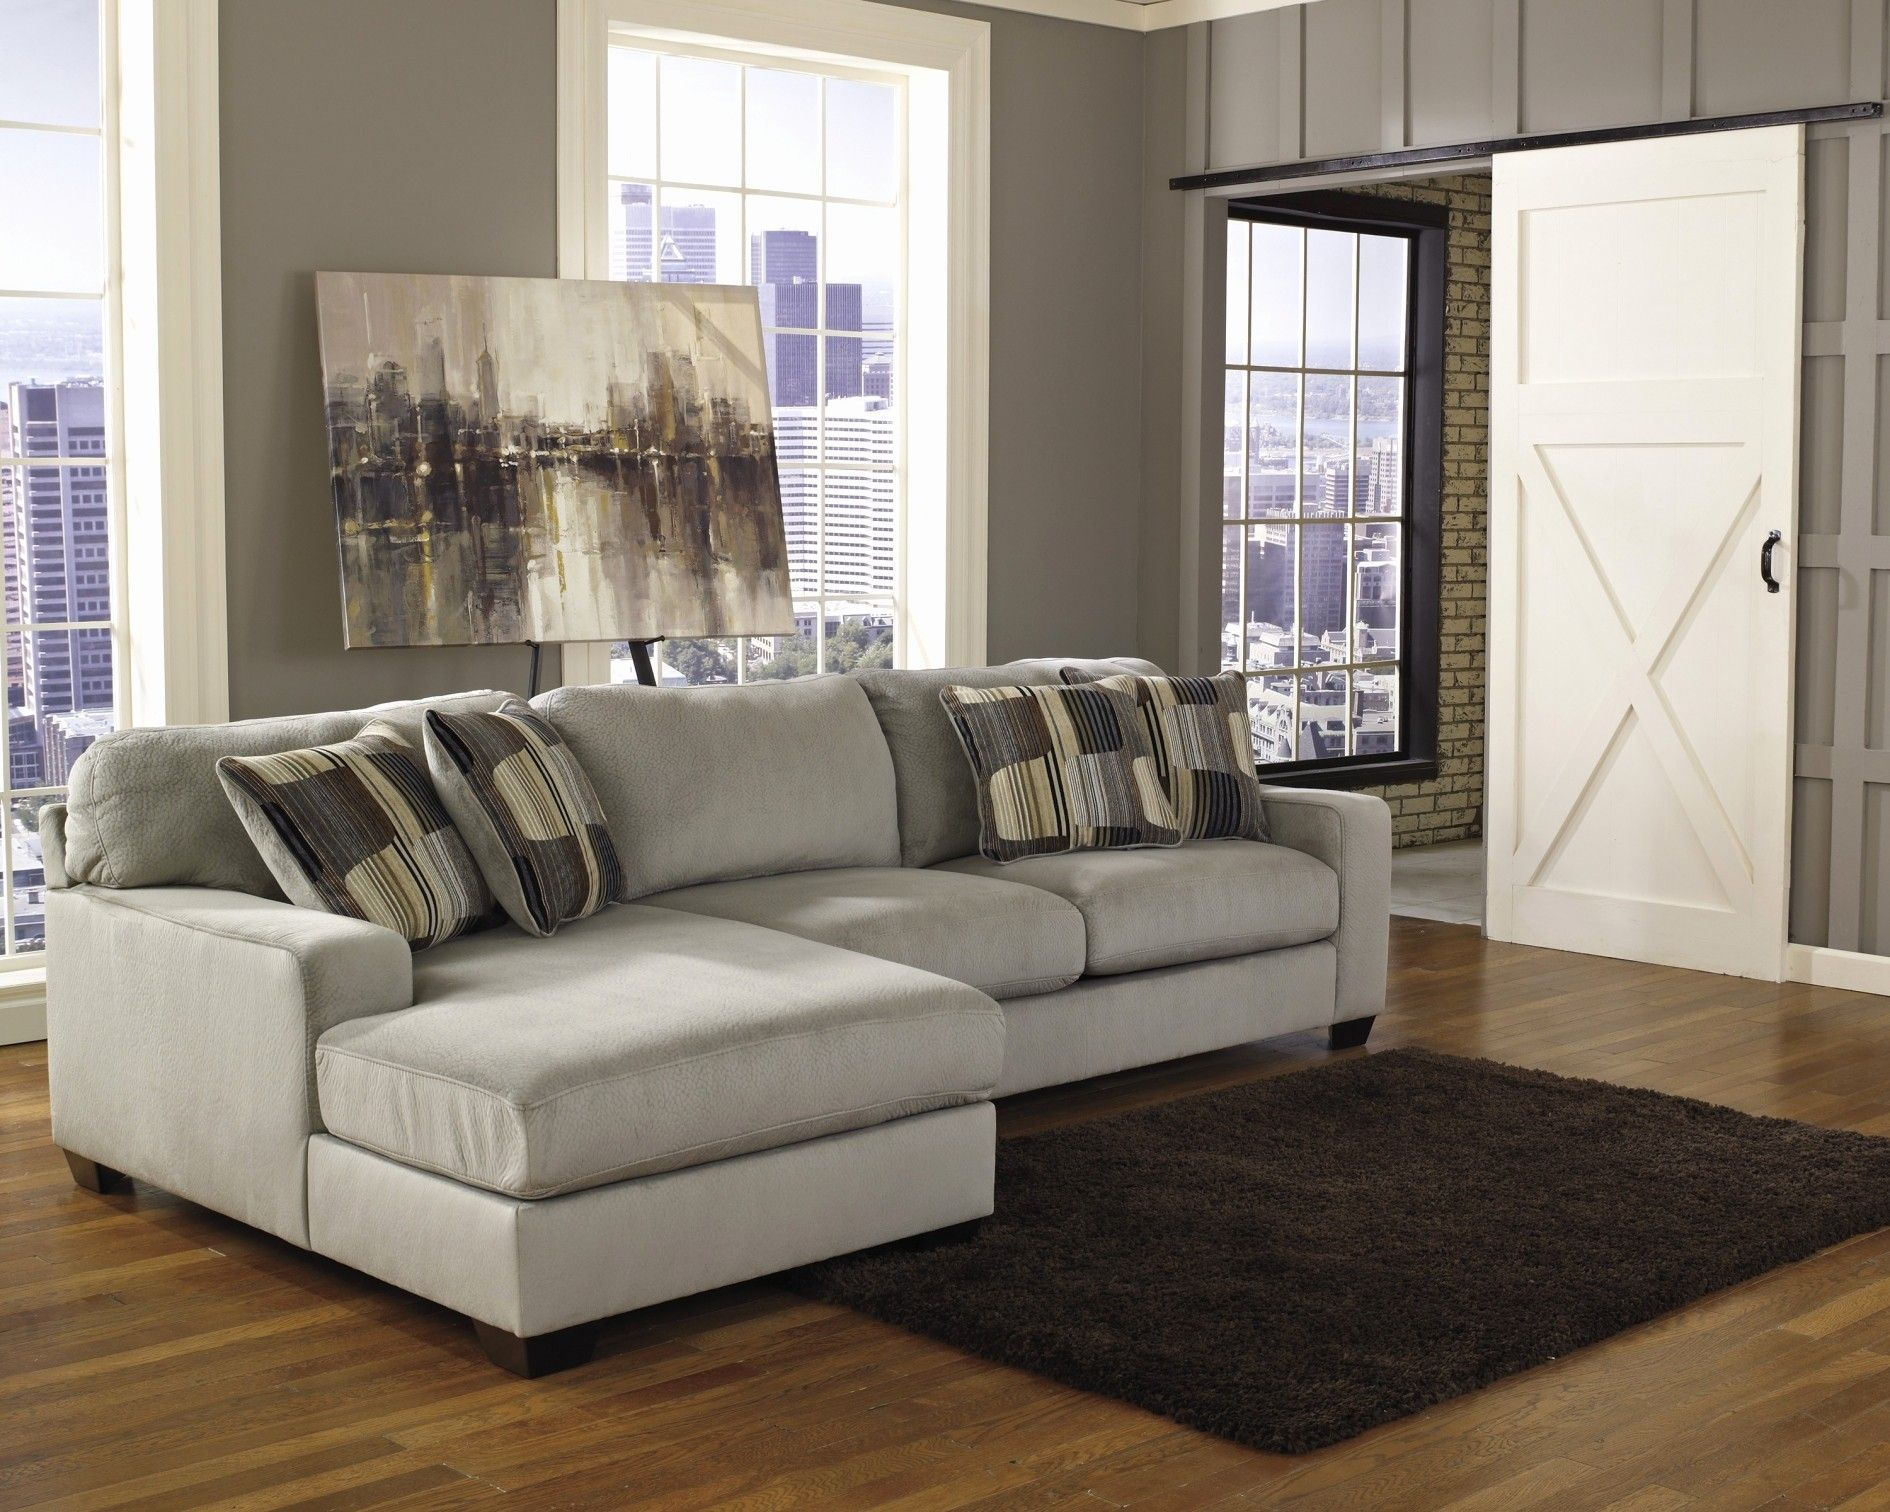 Ekornes toseter sofa i behagelig Alcantara stoff selges billig for